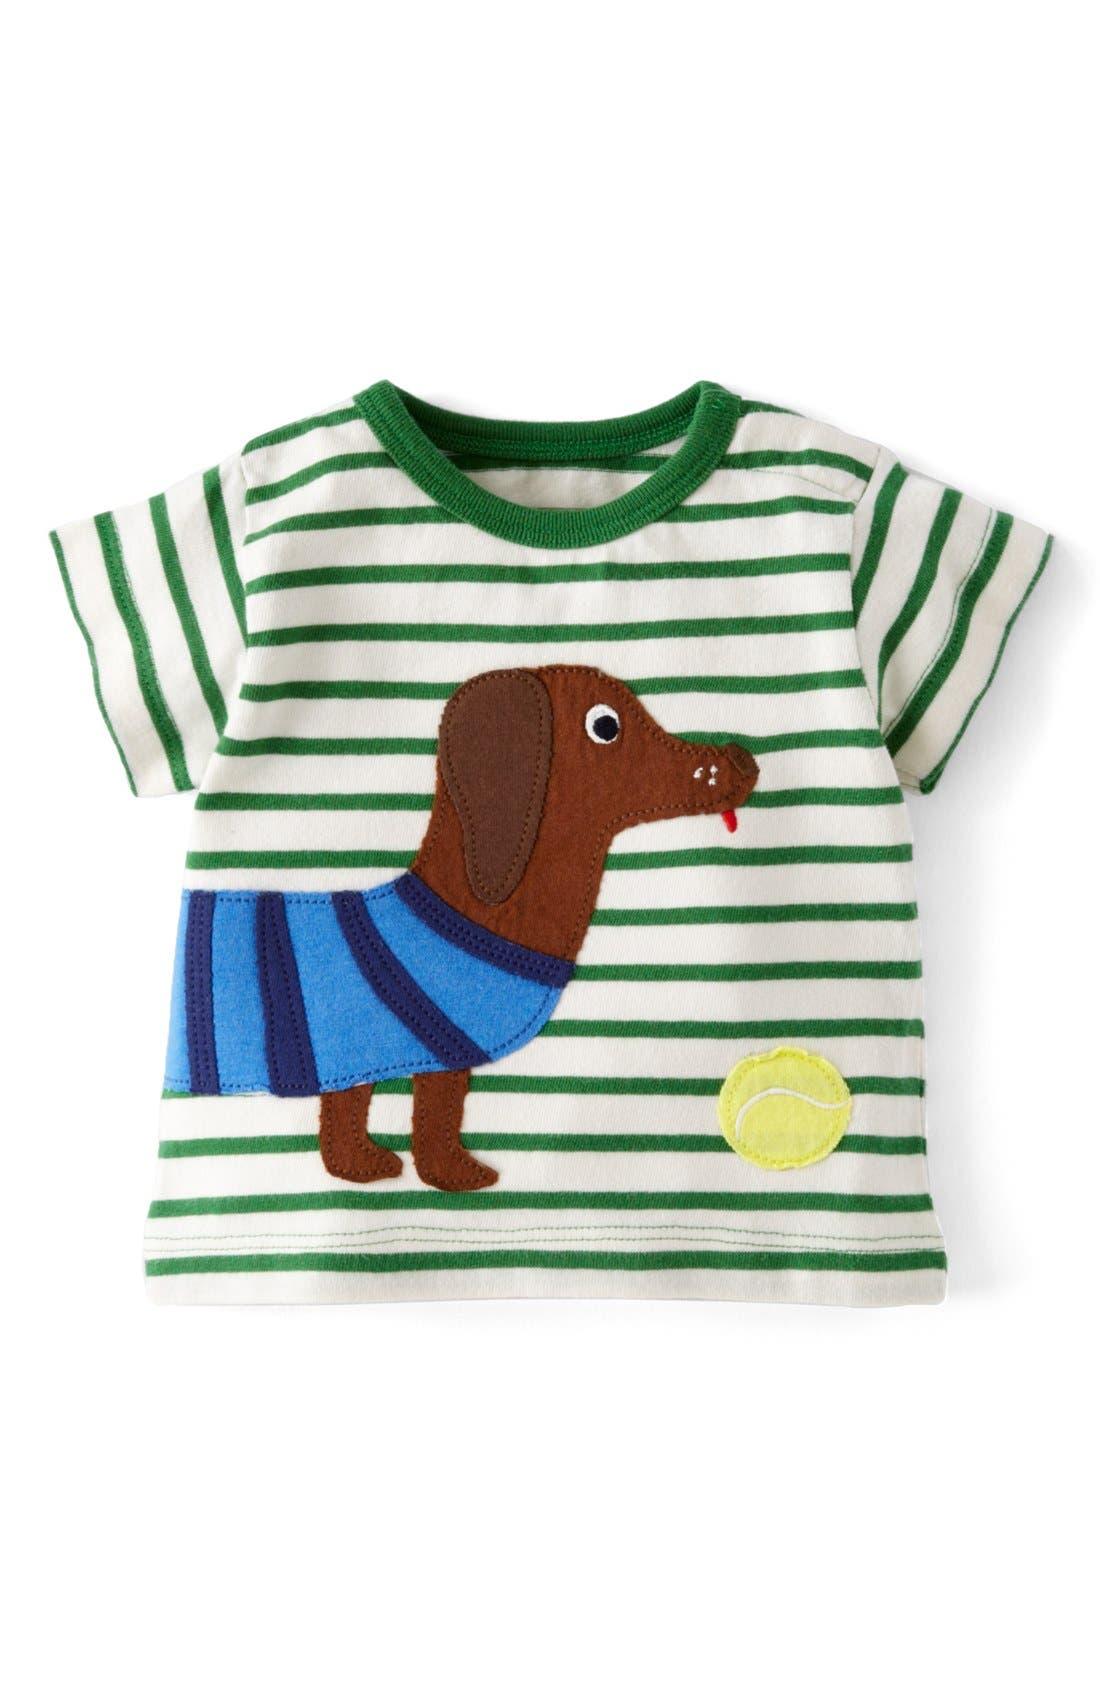 Alternate Image 1 Selected - Mini Boden 'Seaside' Cotton T-Shirt (Baby Boys)